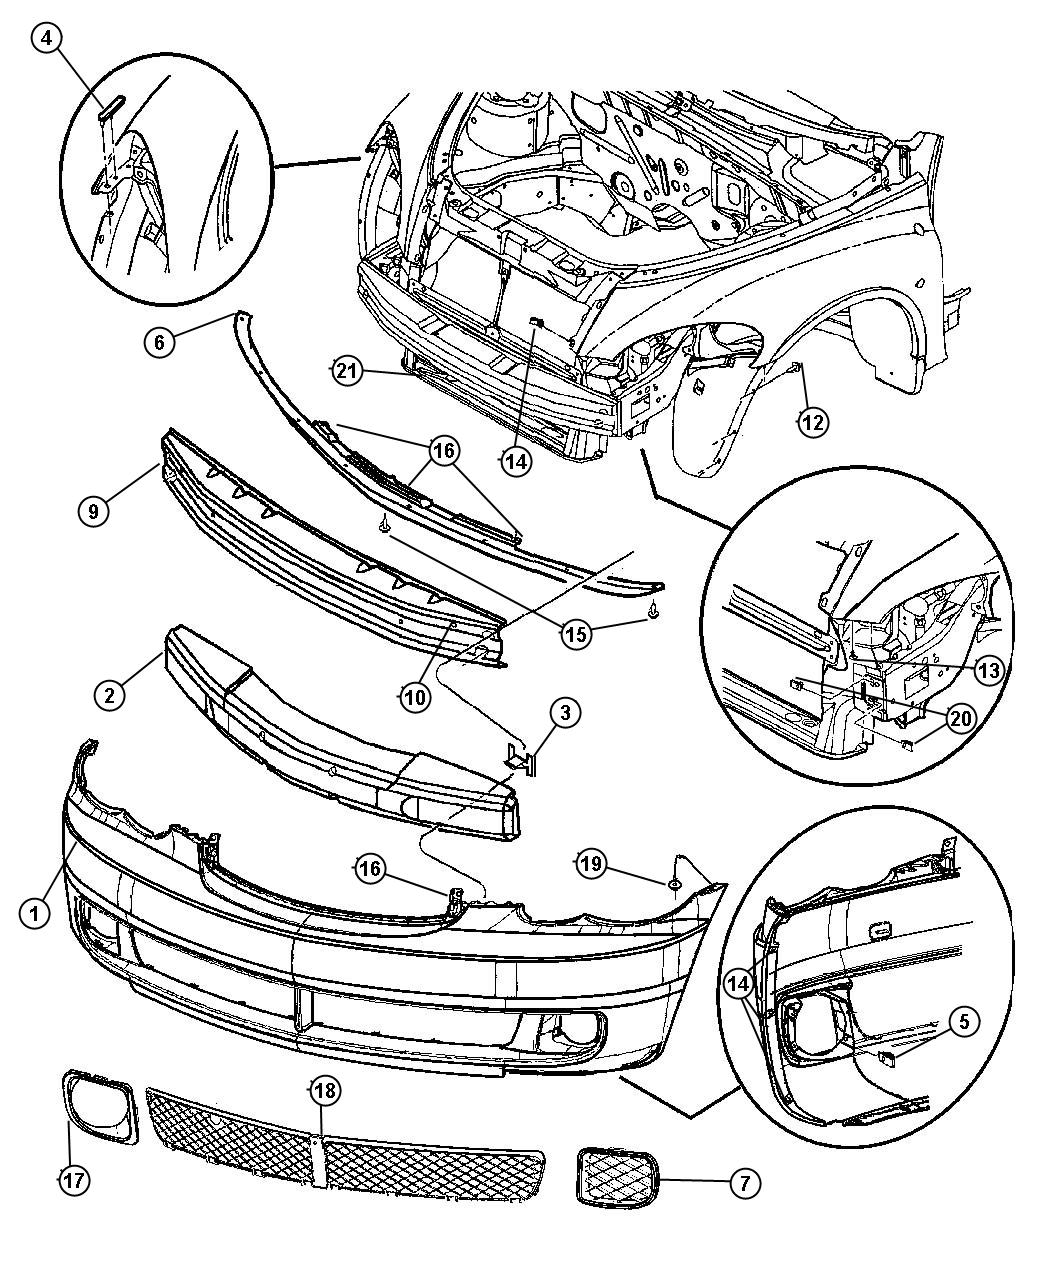 Acura Mdx Fuse Panels. Acura. Auto Fuse Box Diagram